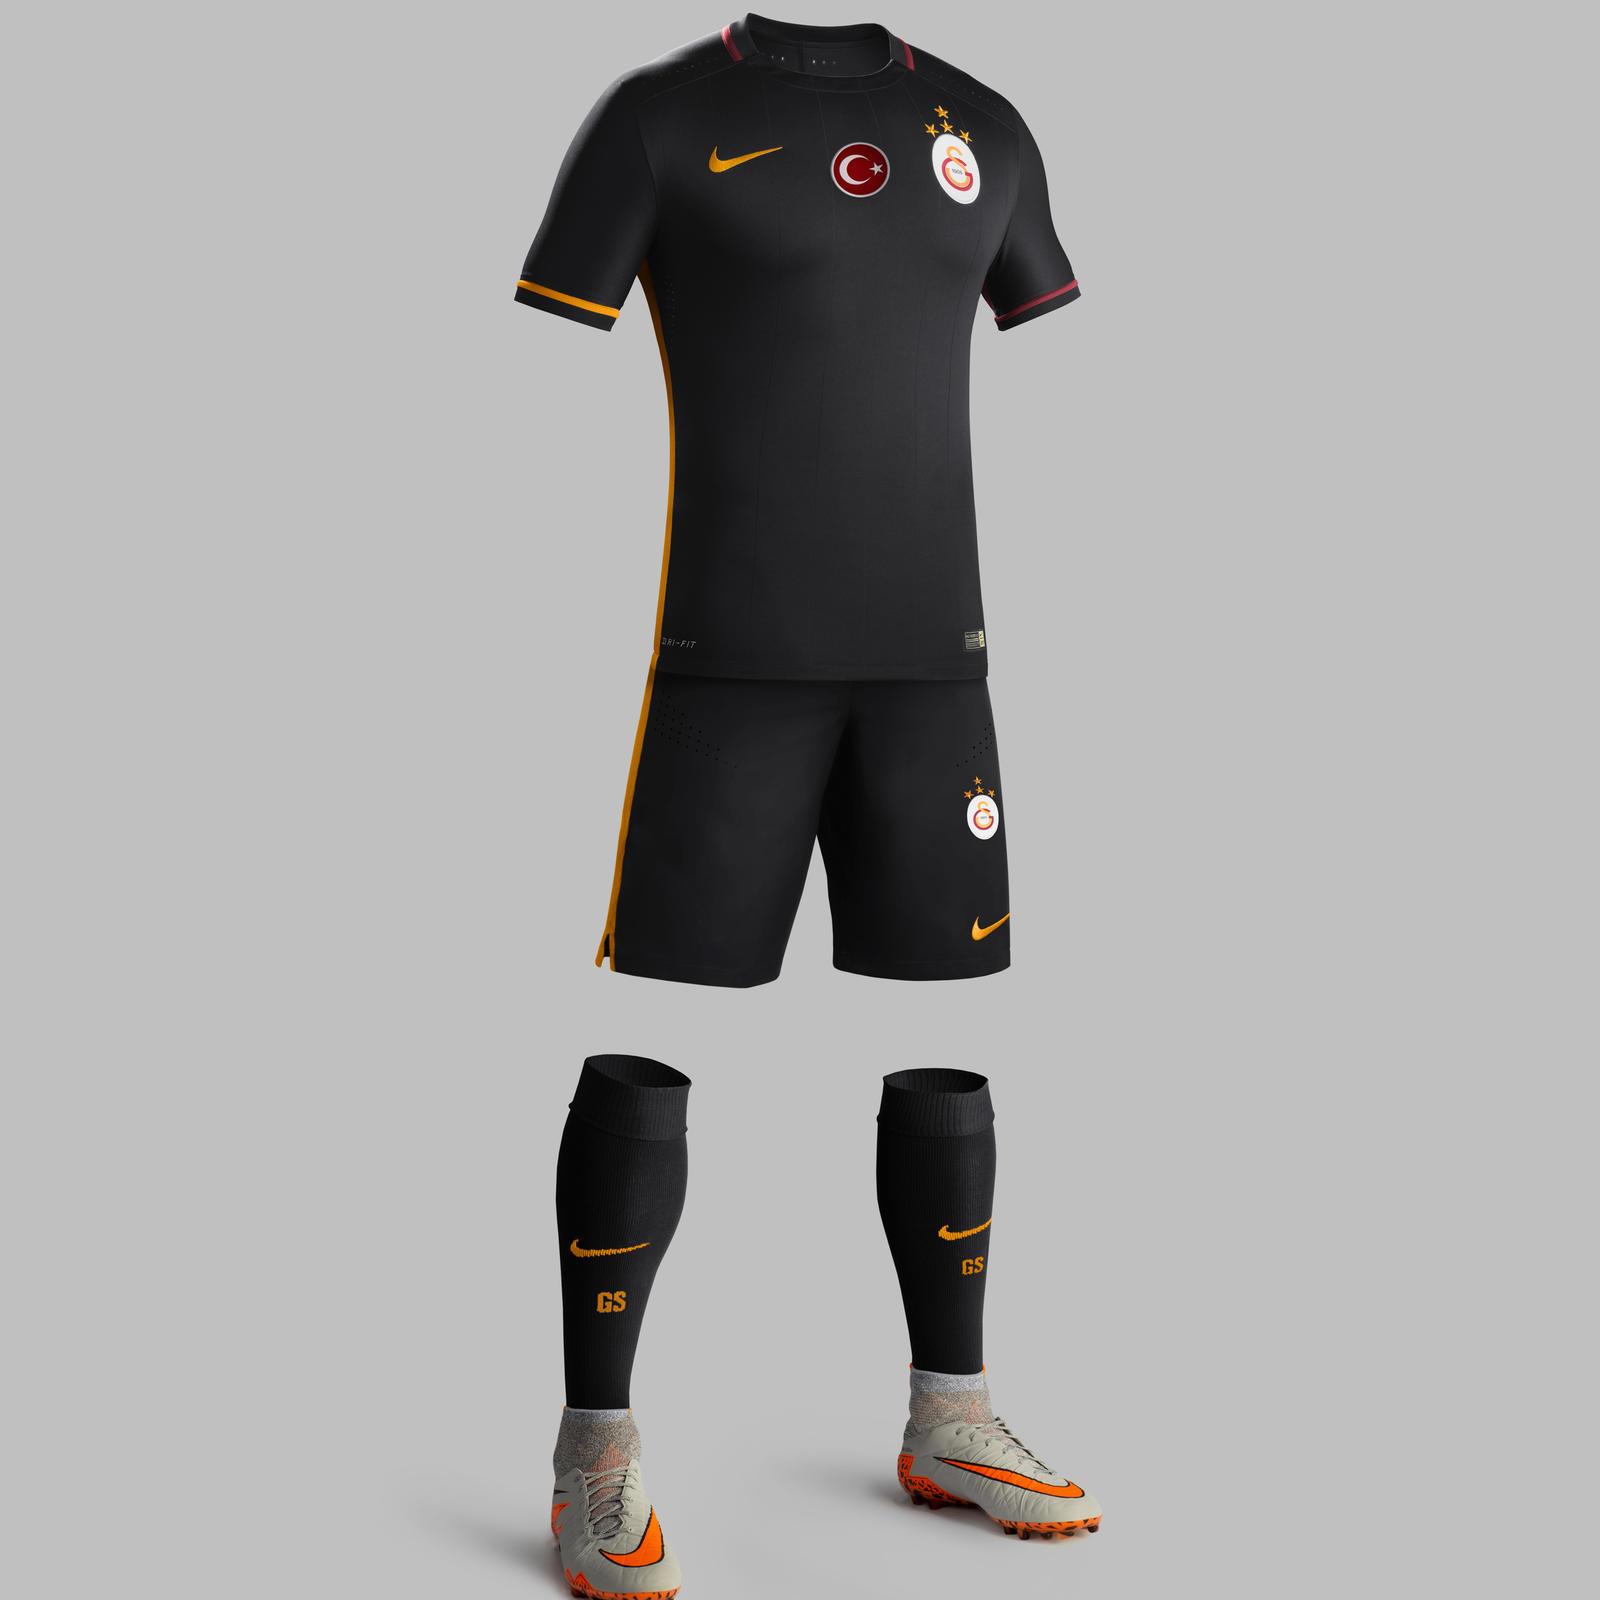 pretty nice 14f54 6b53a Galatasaray 2015-16 Kit Celebrates An Historical Achievement ...